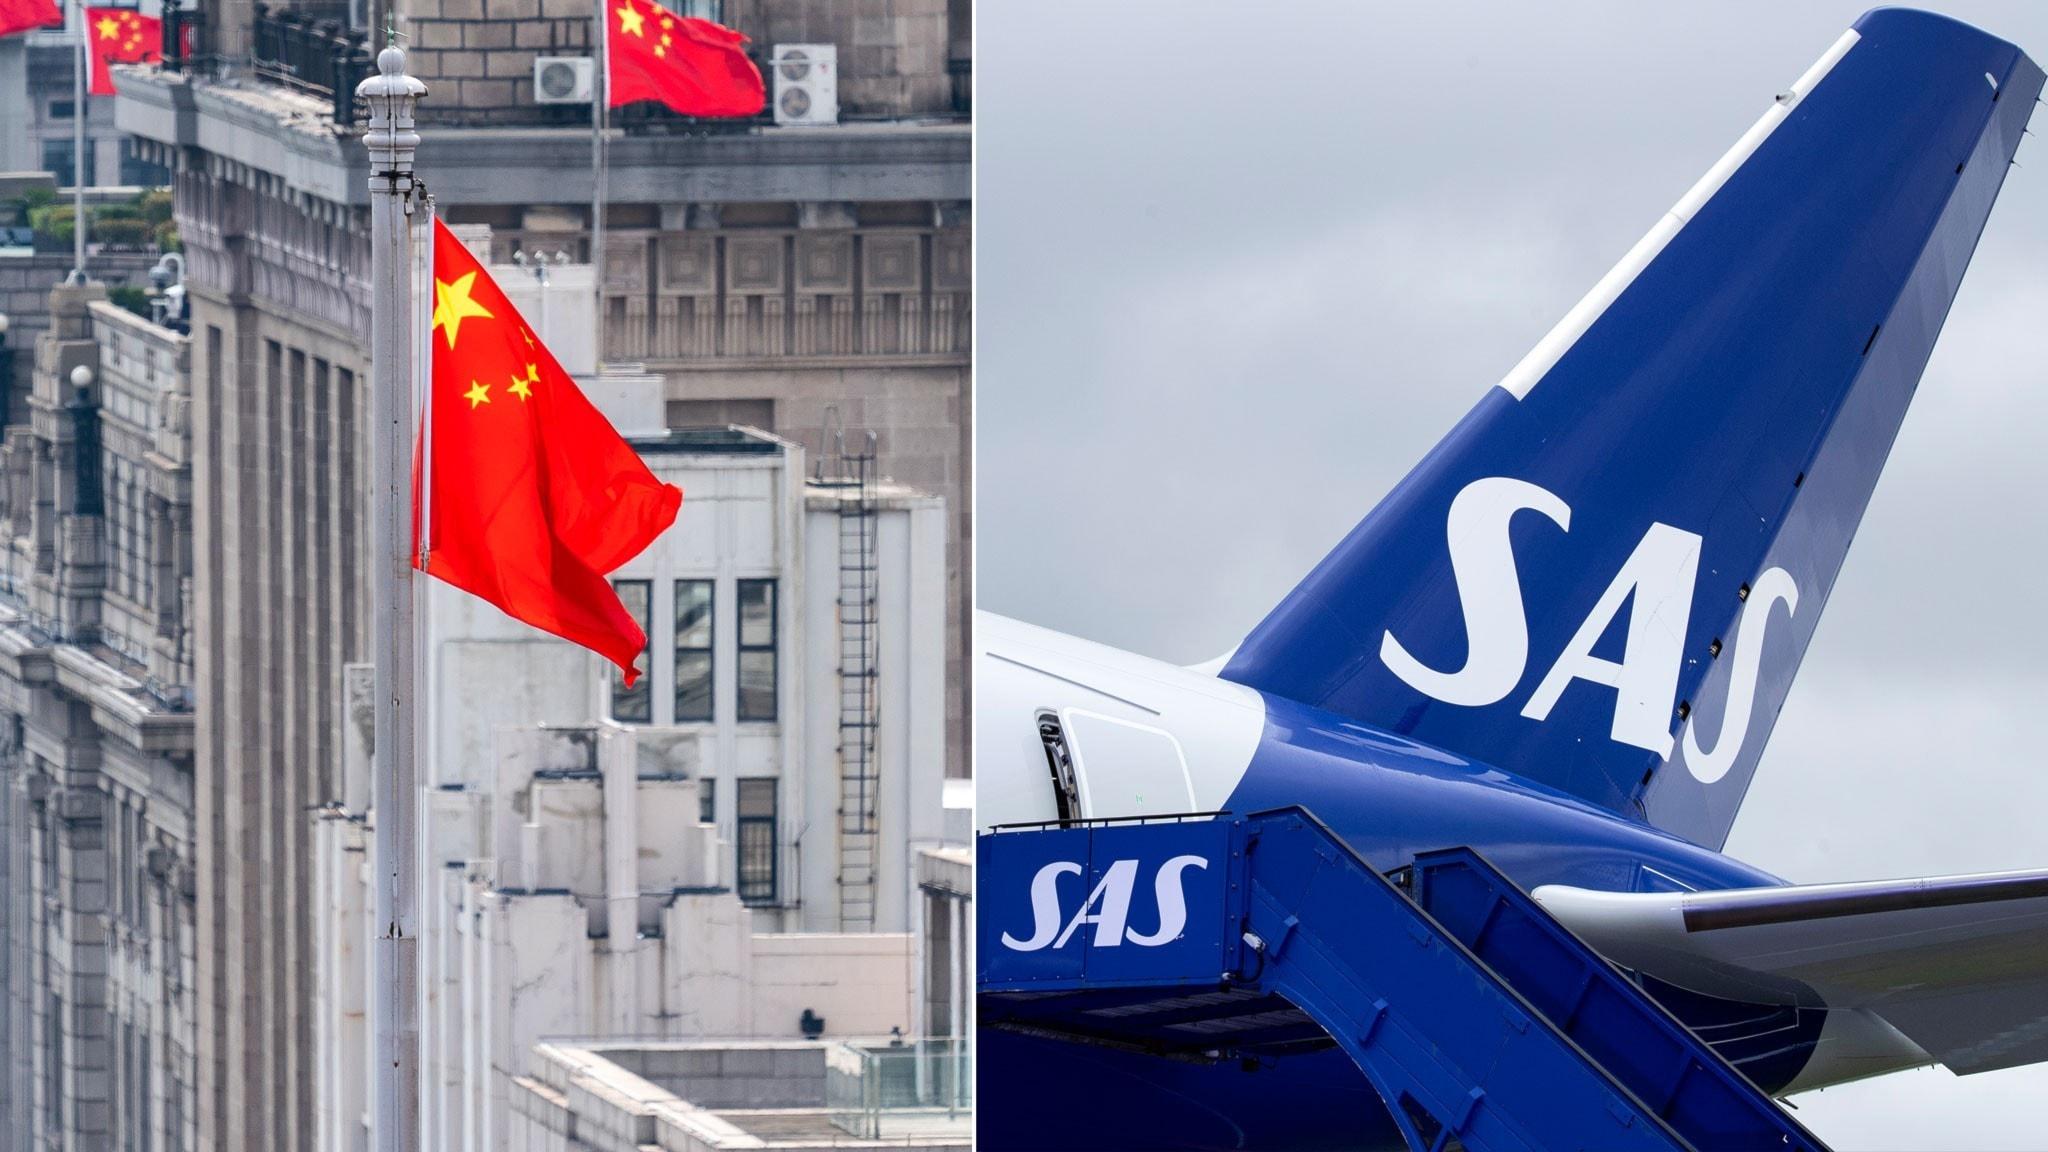 SAS skyldiga miljarder till Kina